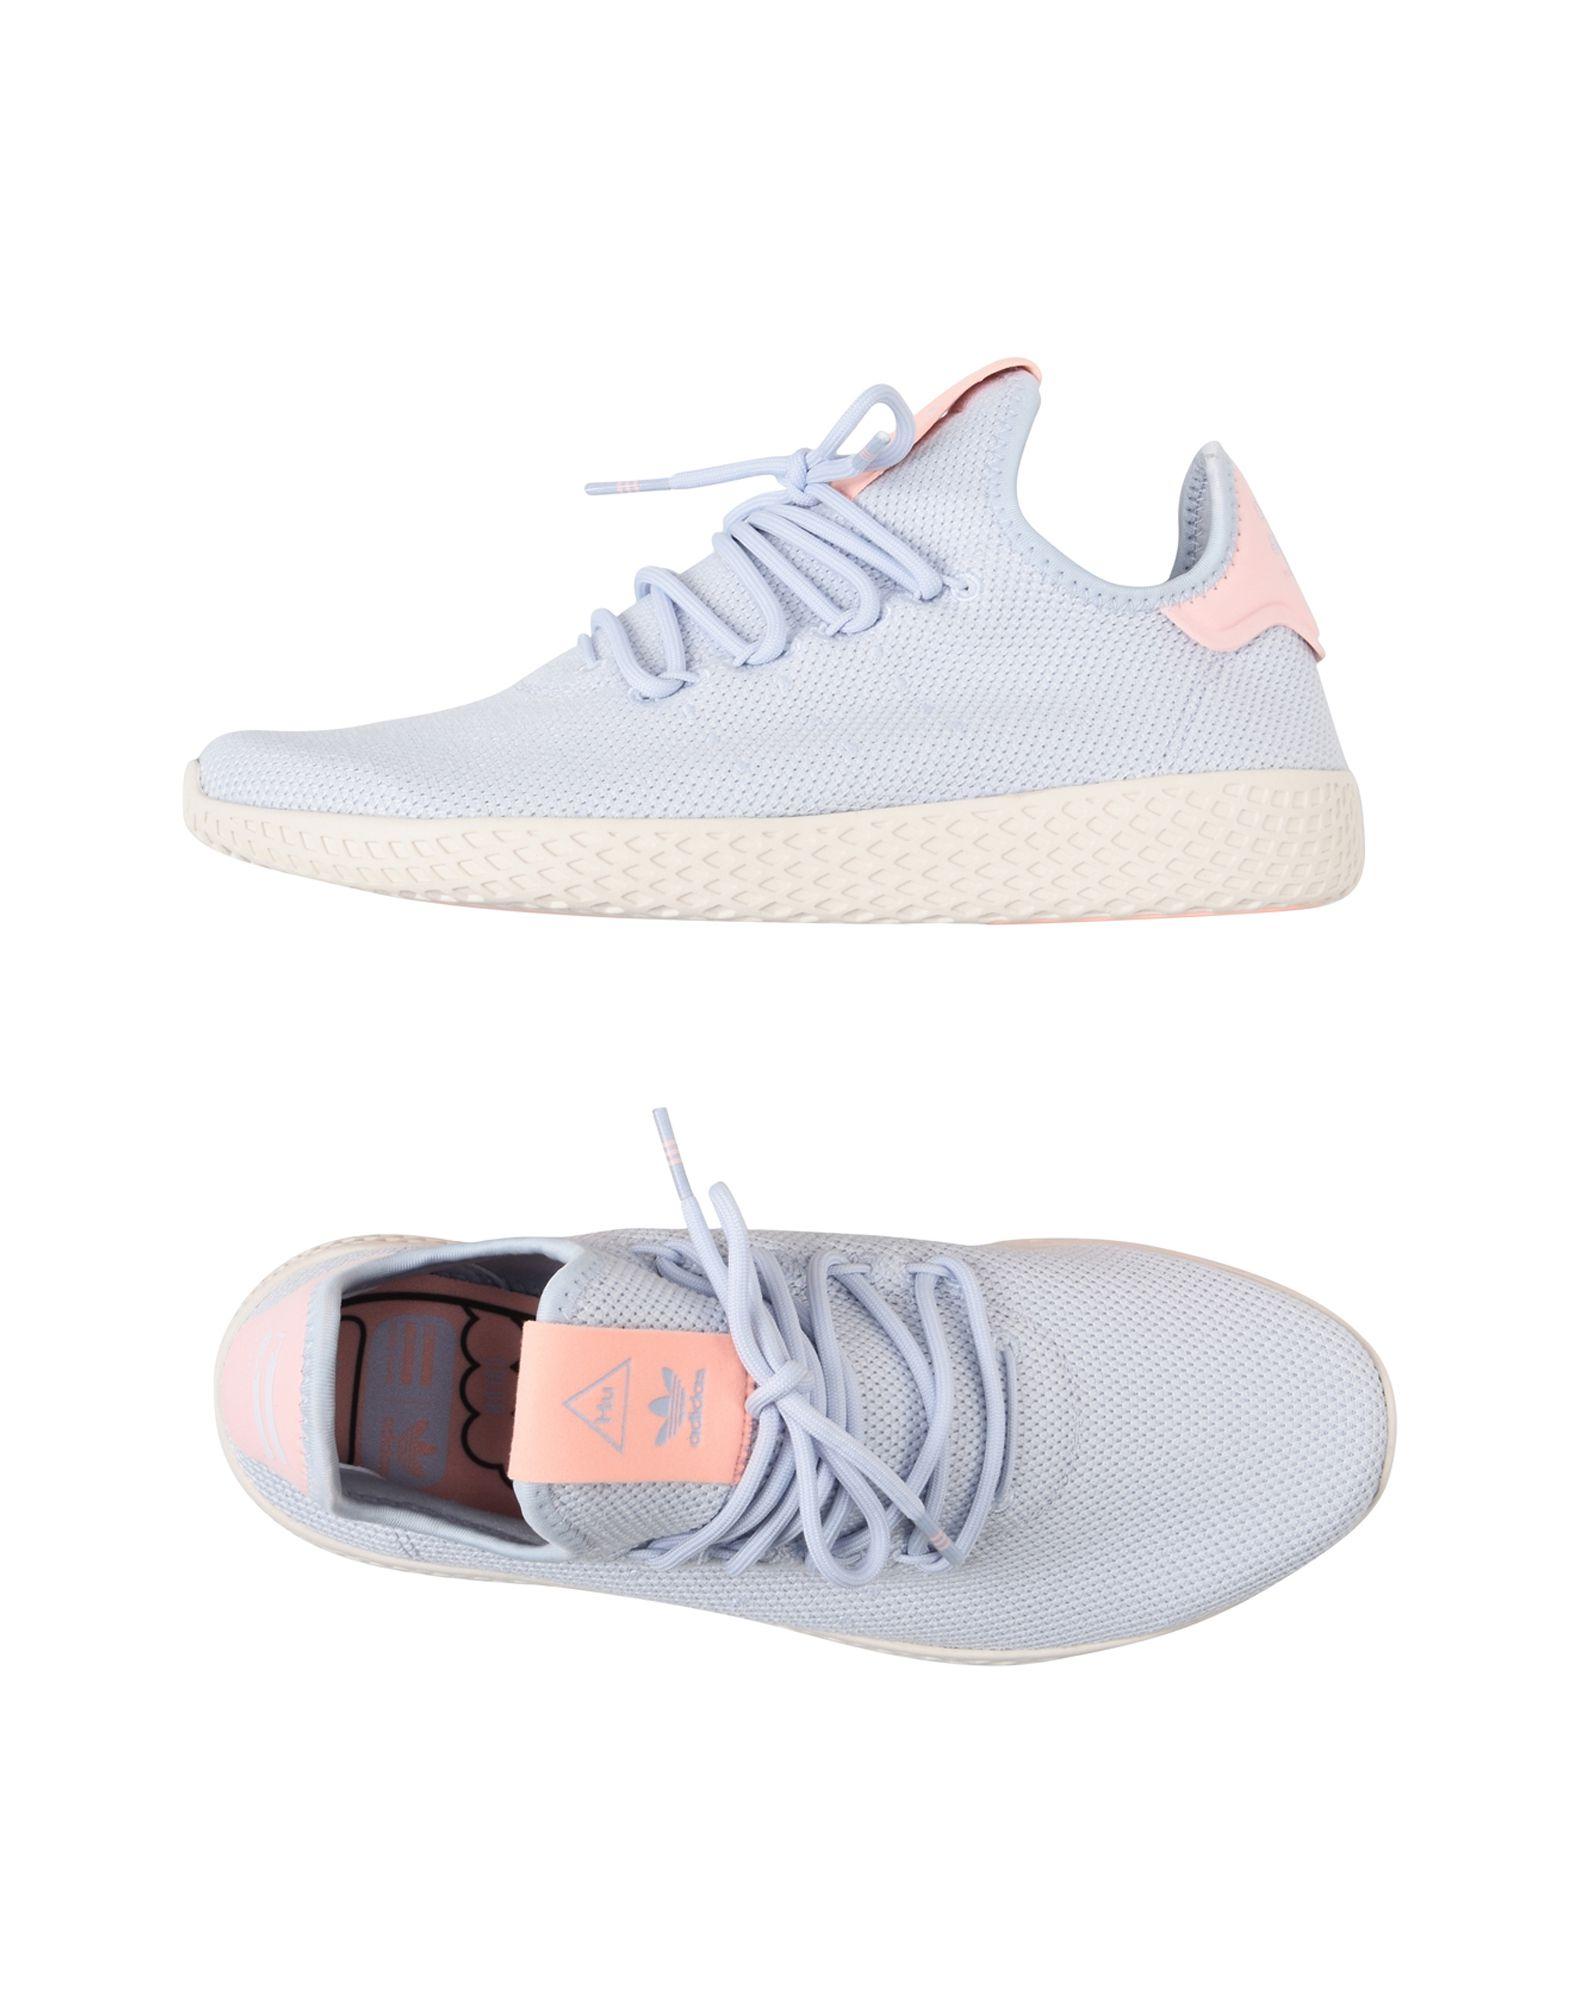 Adidas Pw Originals By Pharrell Williams Pw Adidas Tennis Hu W - Sneakers - Women Adidas Originals By Pharrell Williams Sneakers online on  United Kingdom - 11533811AE 9495db